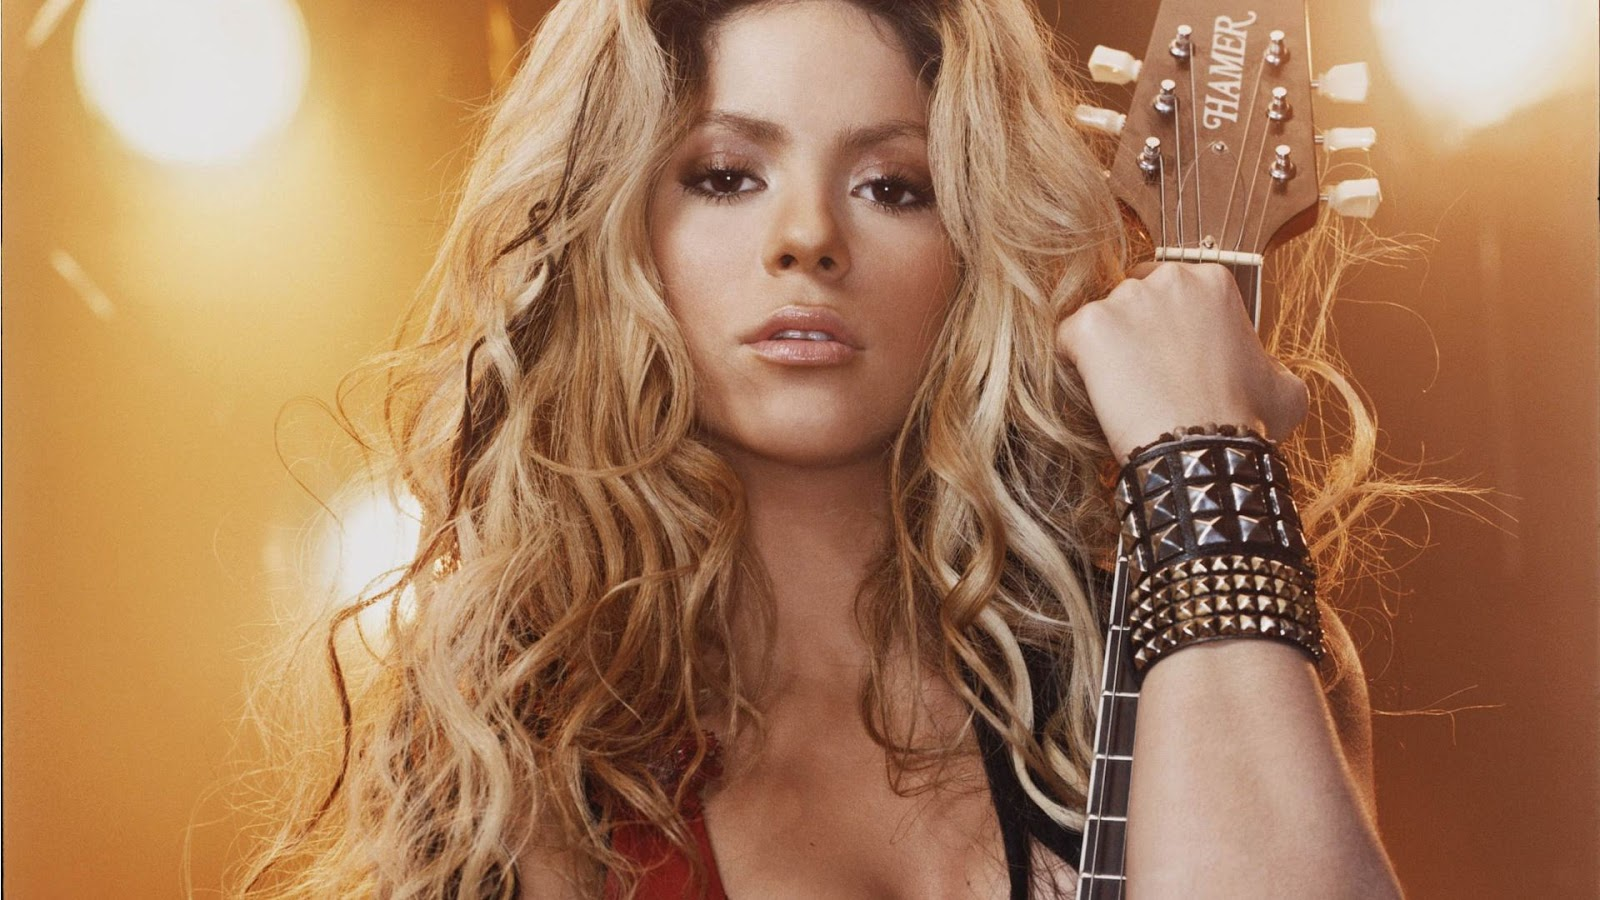 High Resolution Wallpaper Shakira Hd Wallpapers-3472